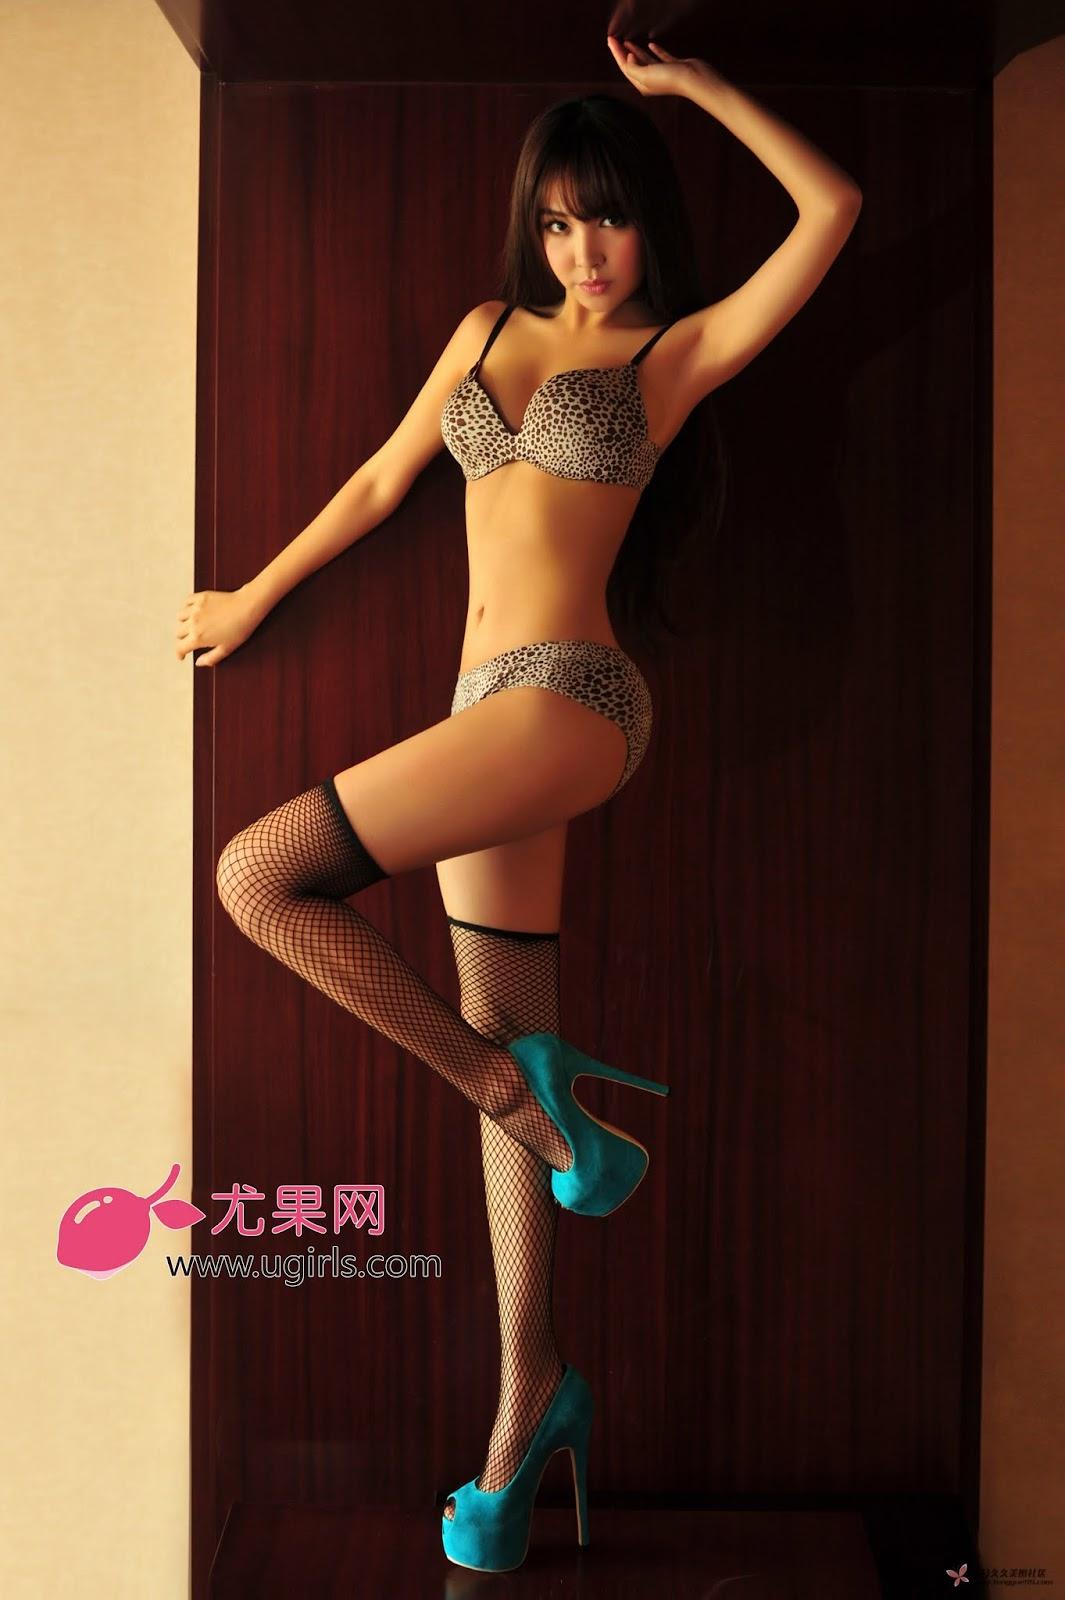 DLS 4715 - Hot Girl Model UGIRLS NO.13